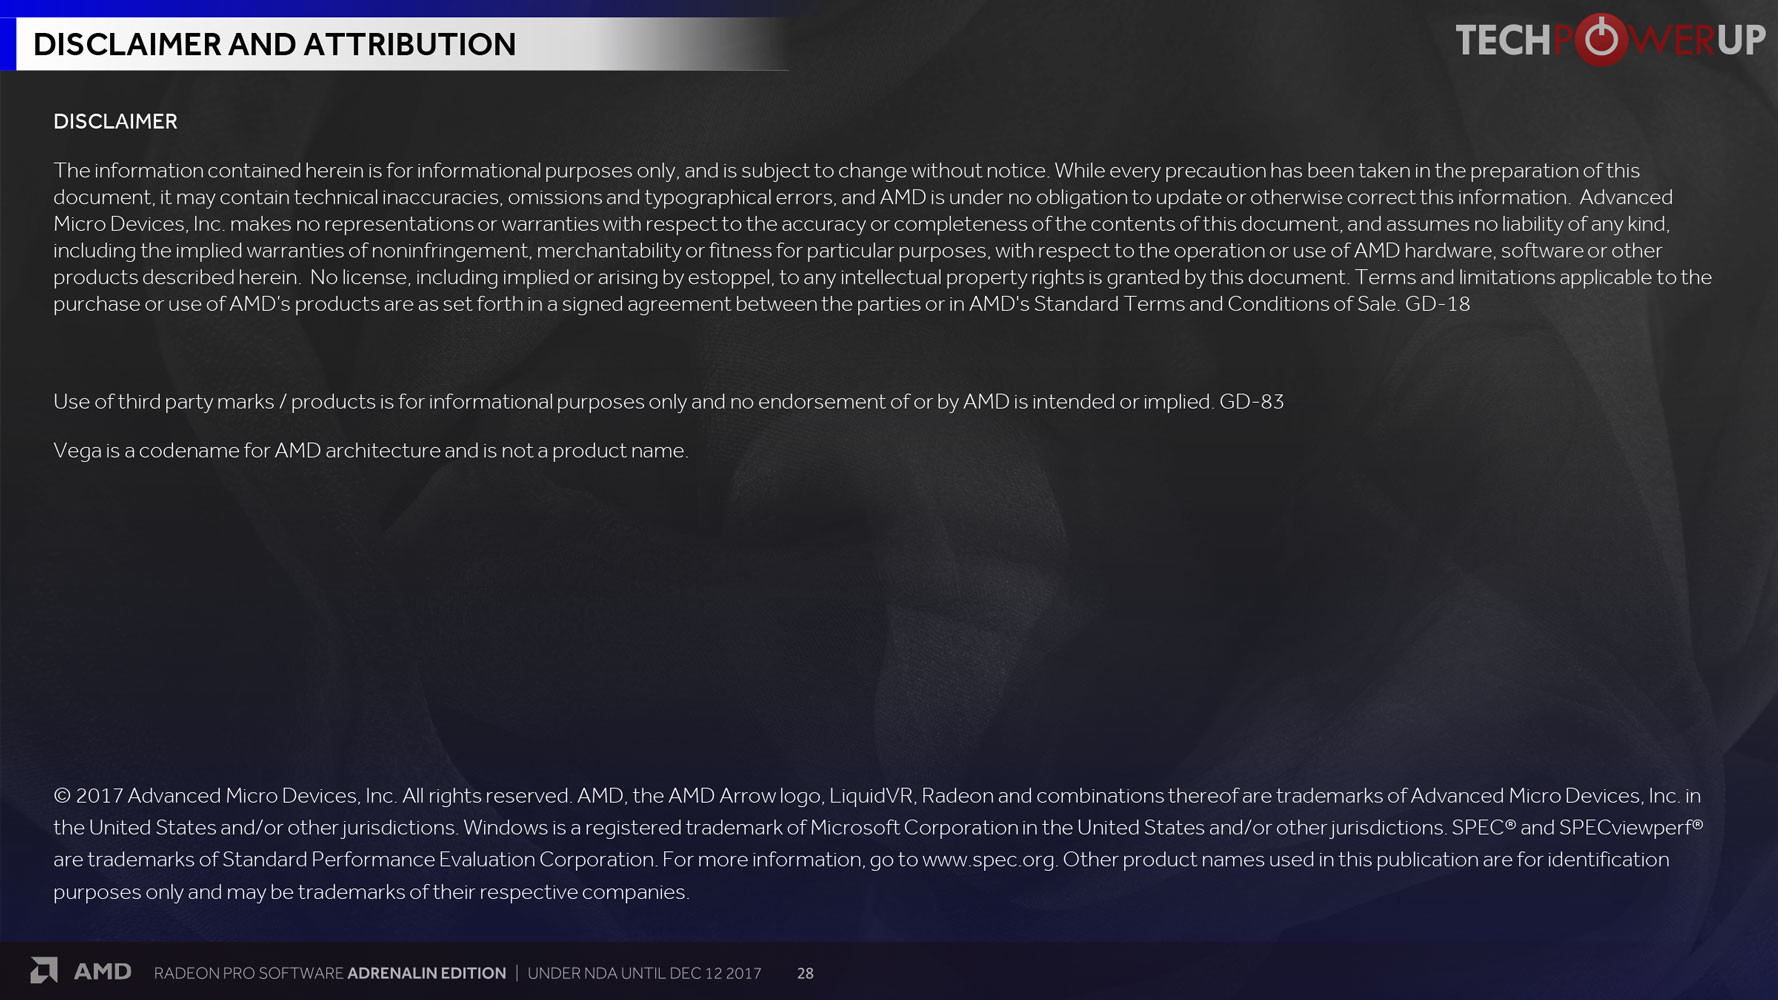 AMD Radeon Pro Adrenalin Edition 17 12 1 Drivers Detailed | TechPowerUp